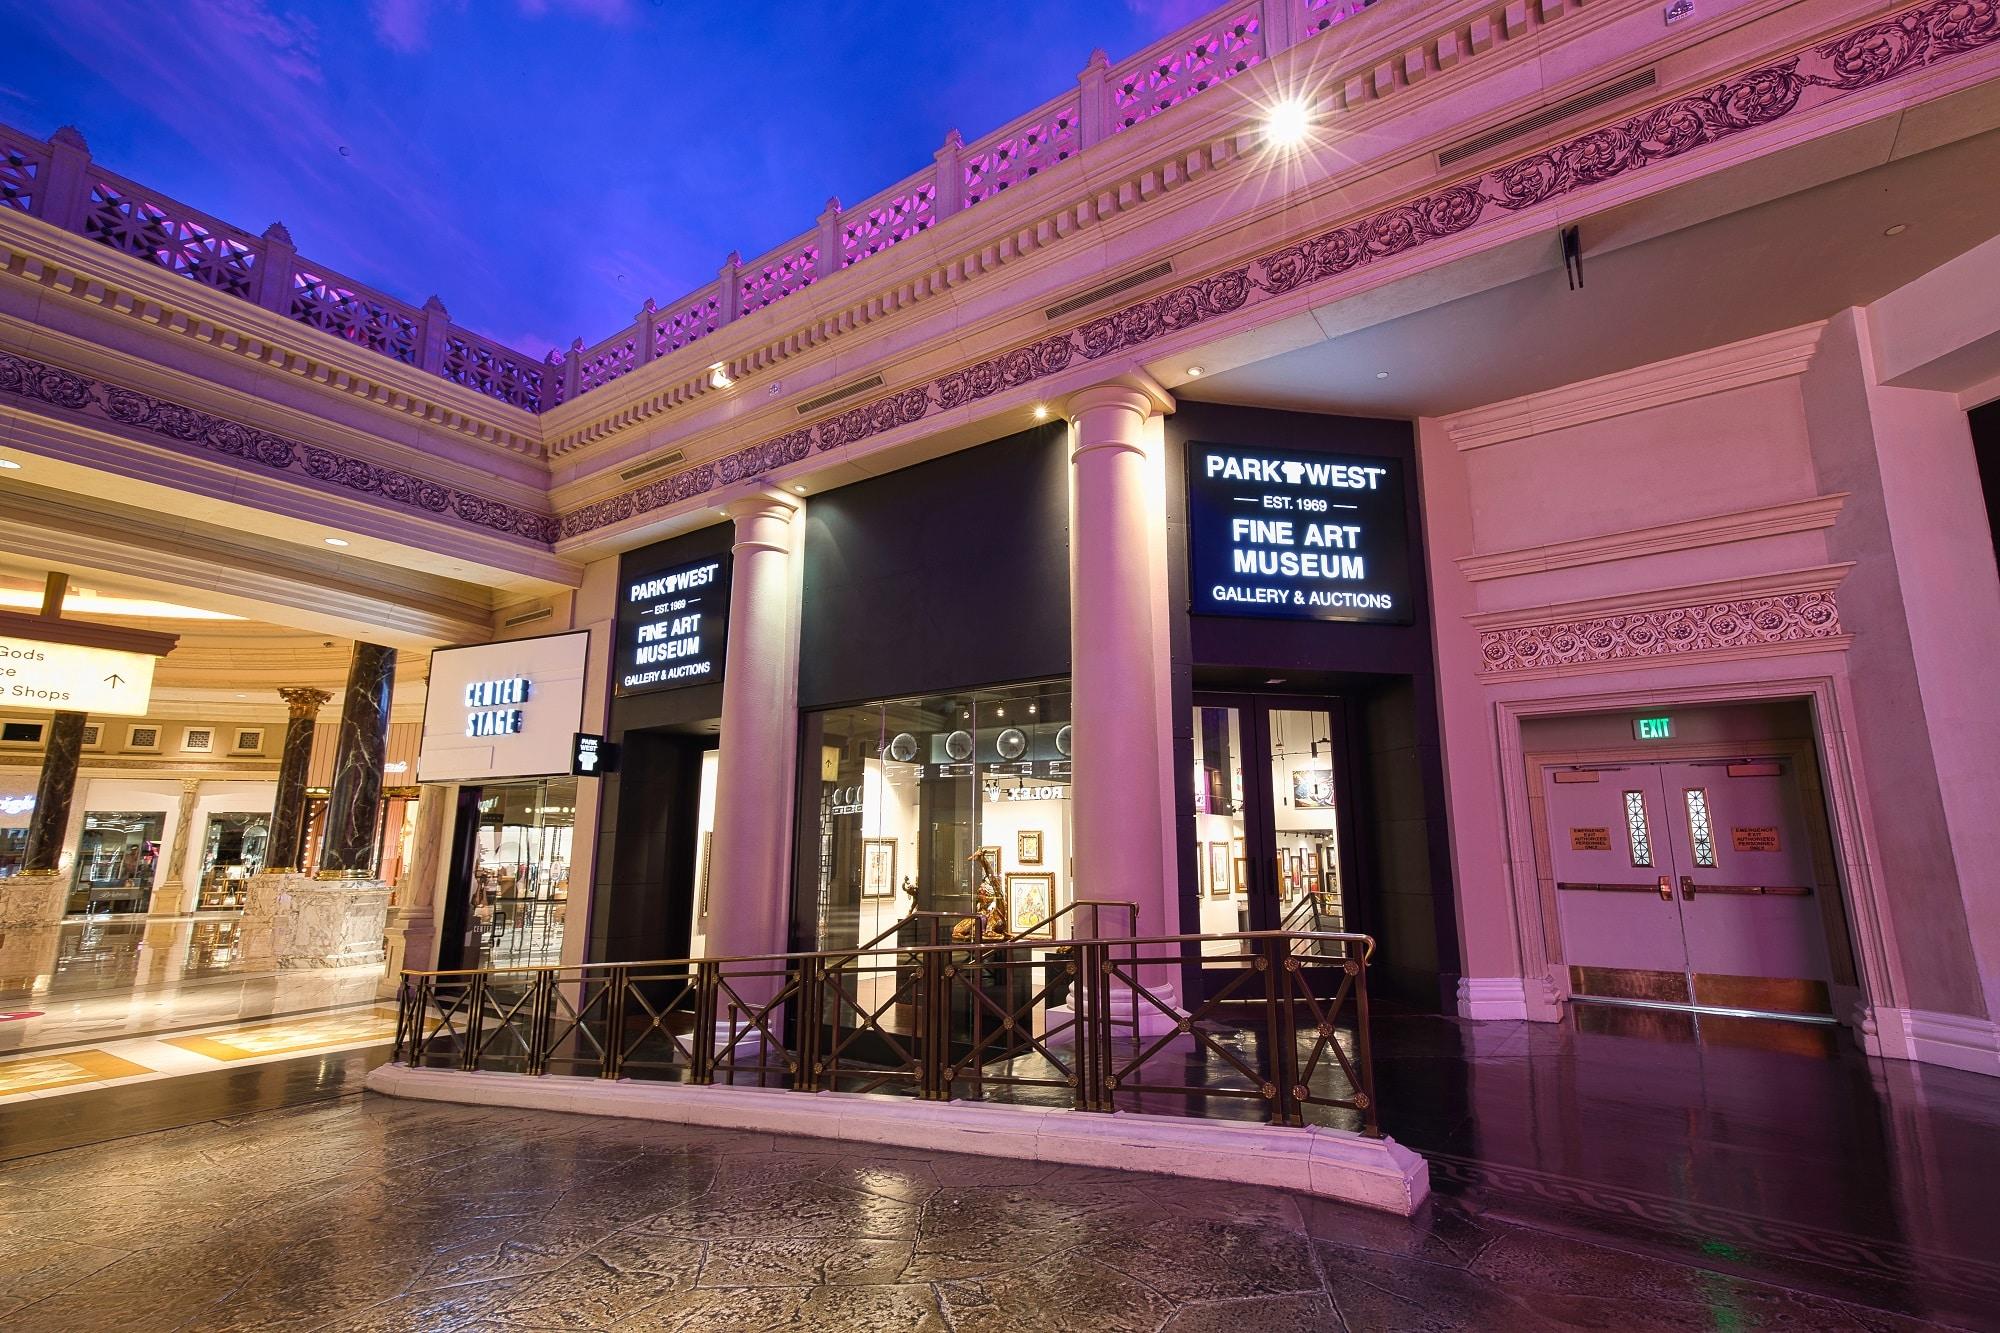 Park West Fine Art Museum and Gallery Las Vegas